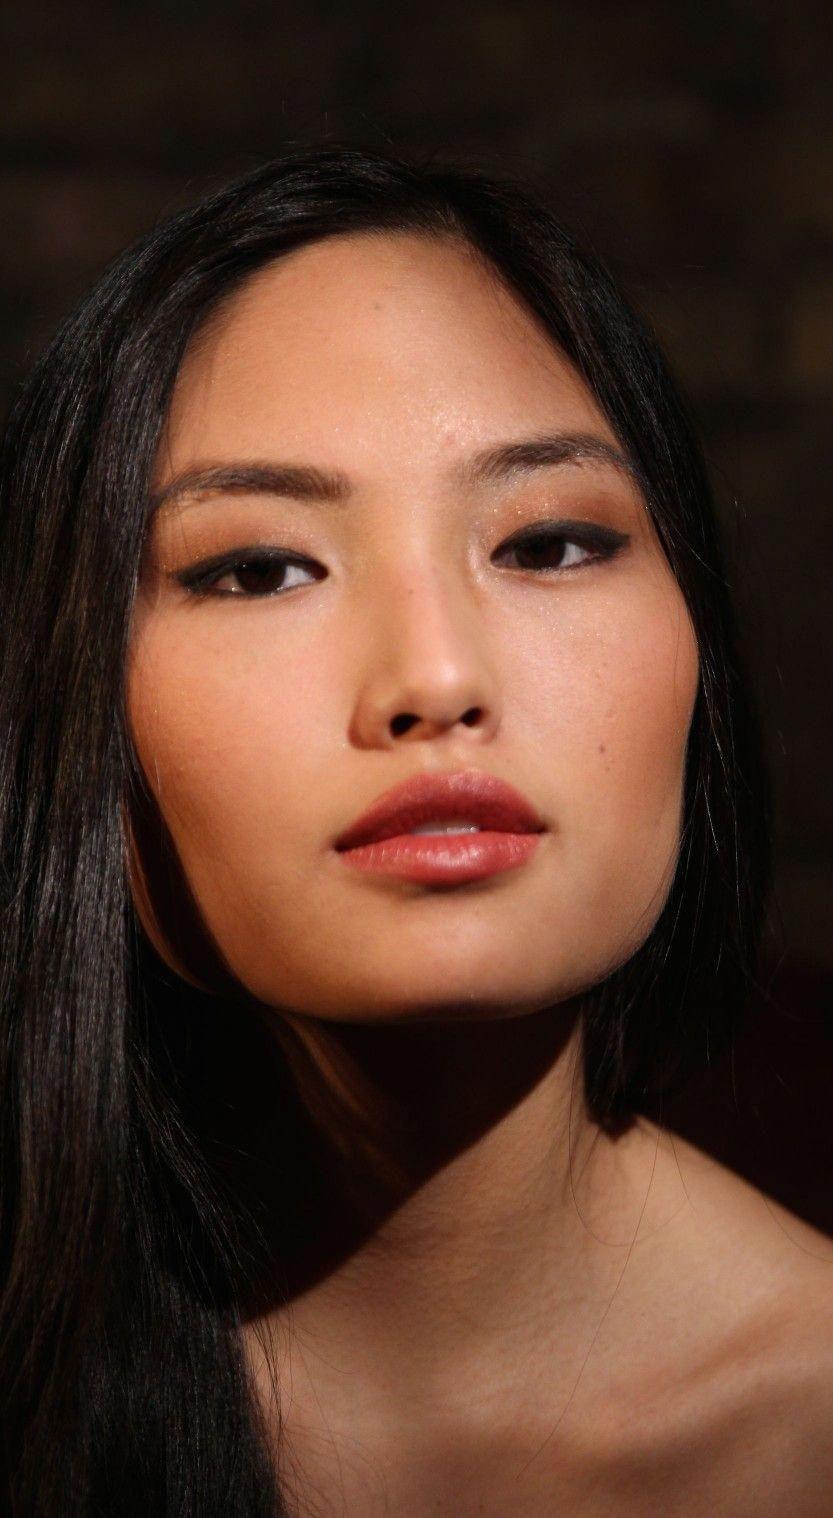 Makeup for tan/dark skin asian bestmakeupforwedding